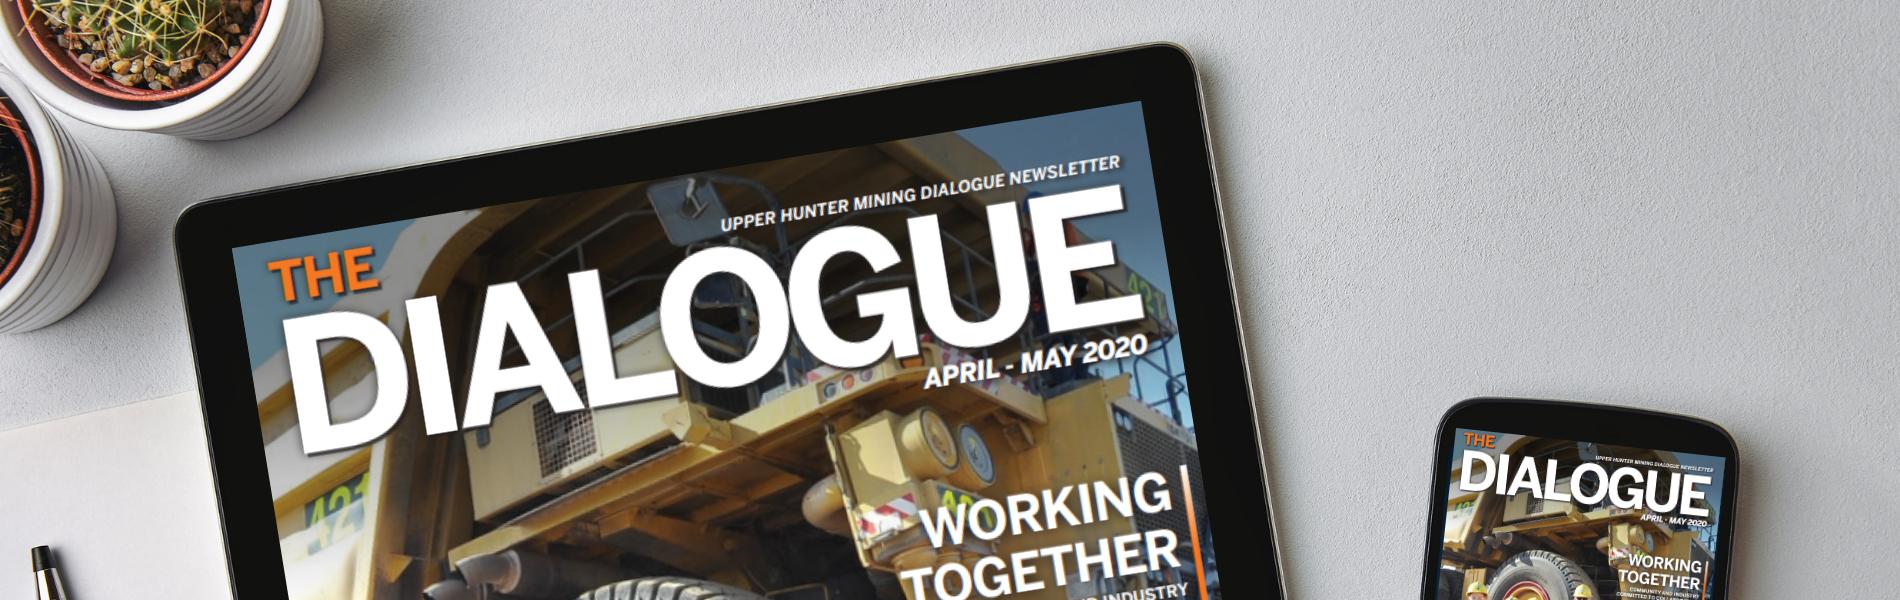 Upper Hunter Mining Dialogue July 2018 Newsletter